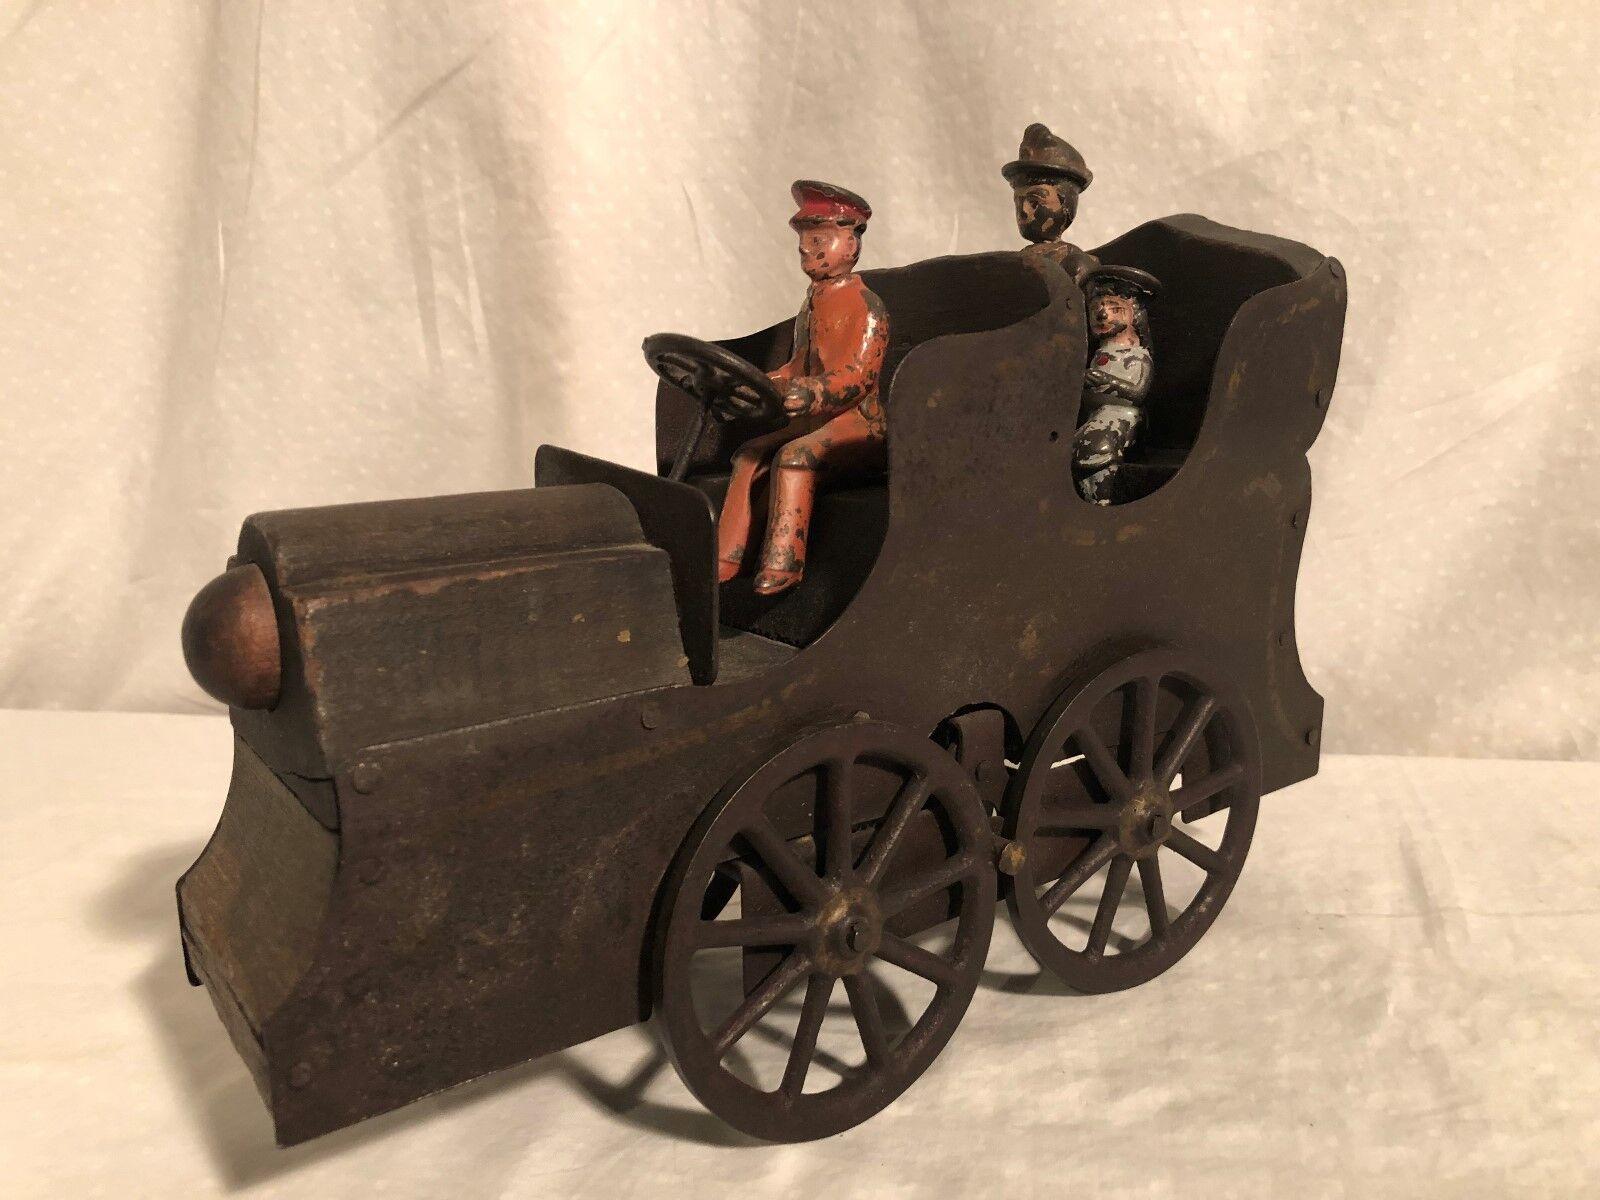 Dp Clark Horseless Carosse Dayton Jouets Friction Petite Enfance Auto Fonte